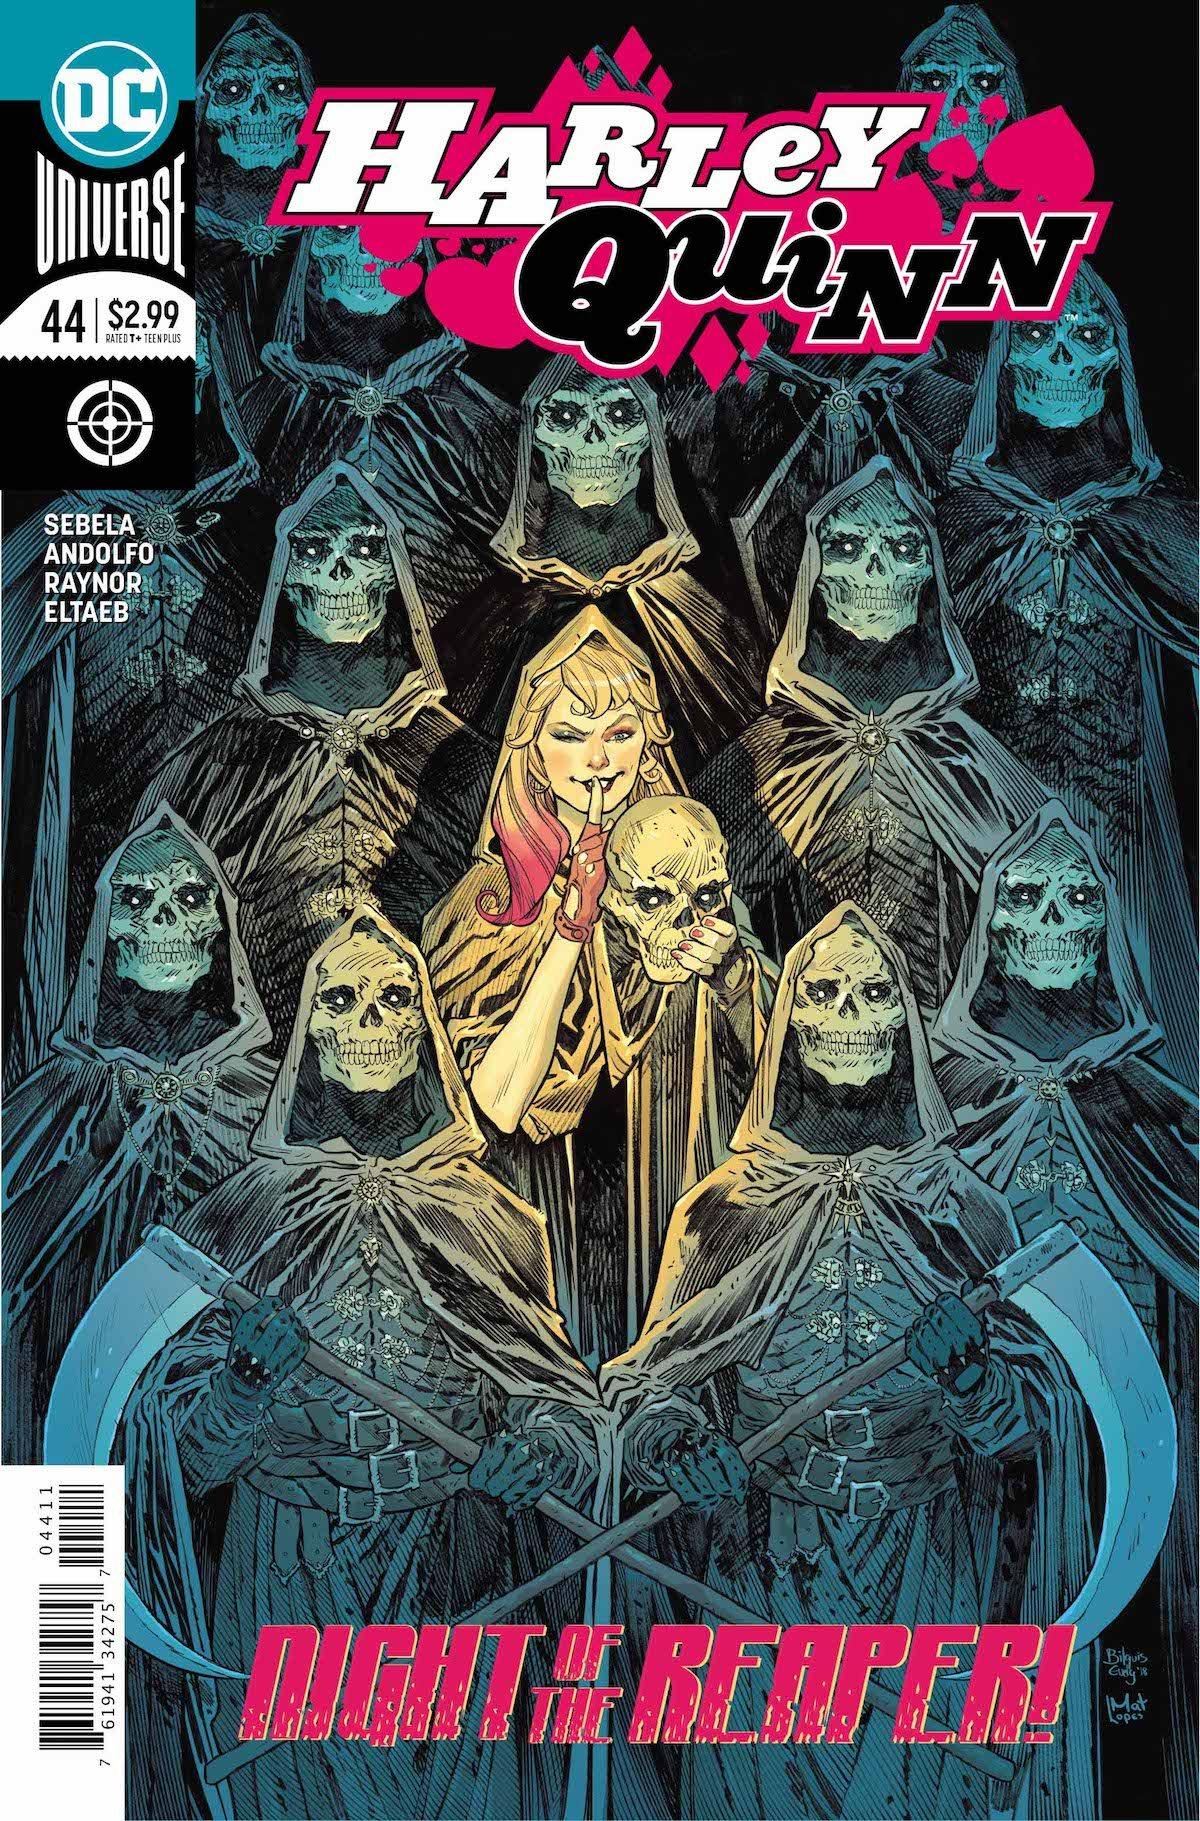 Harley Quinn #44 cover